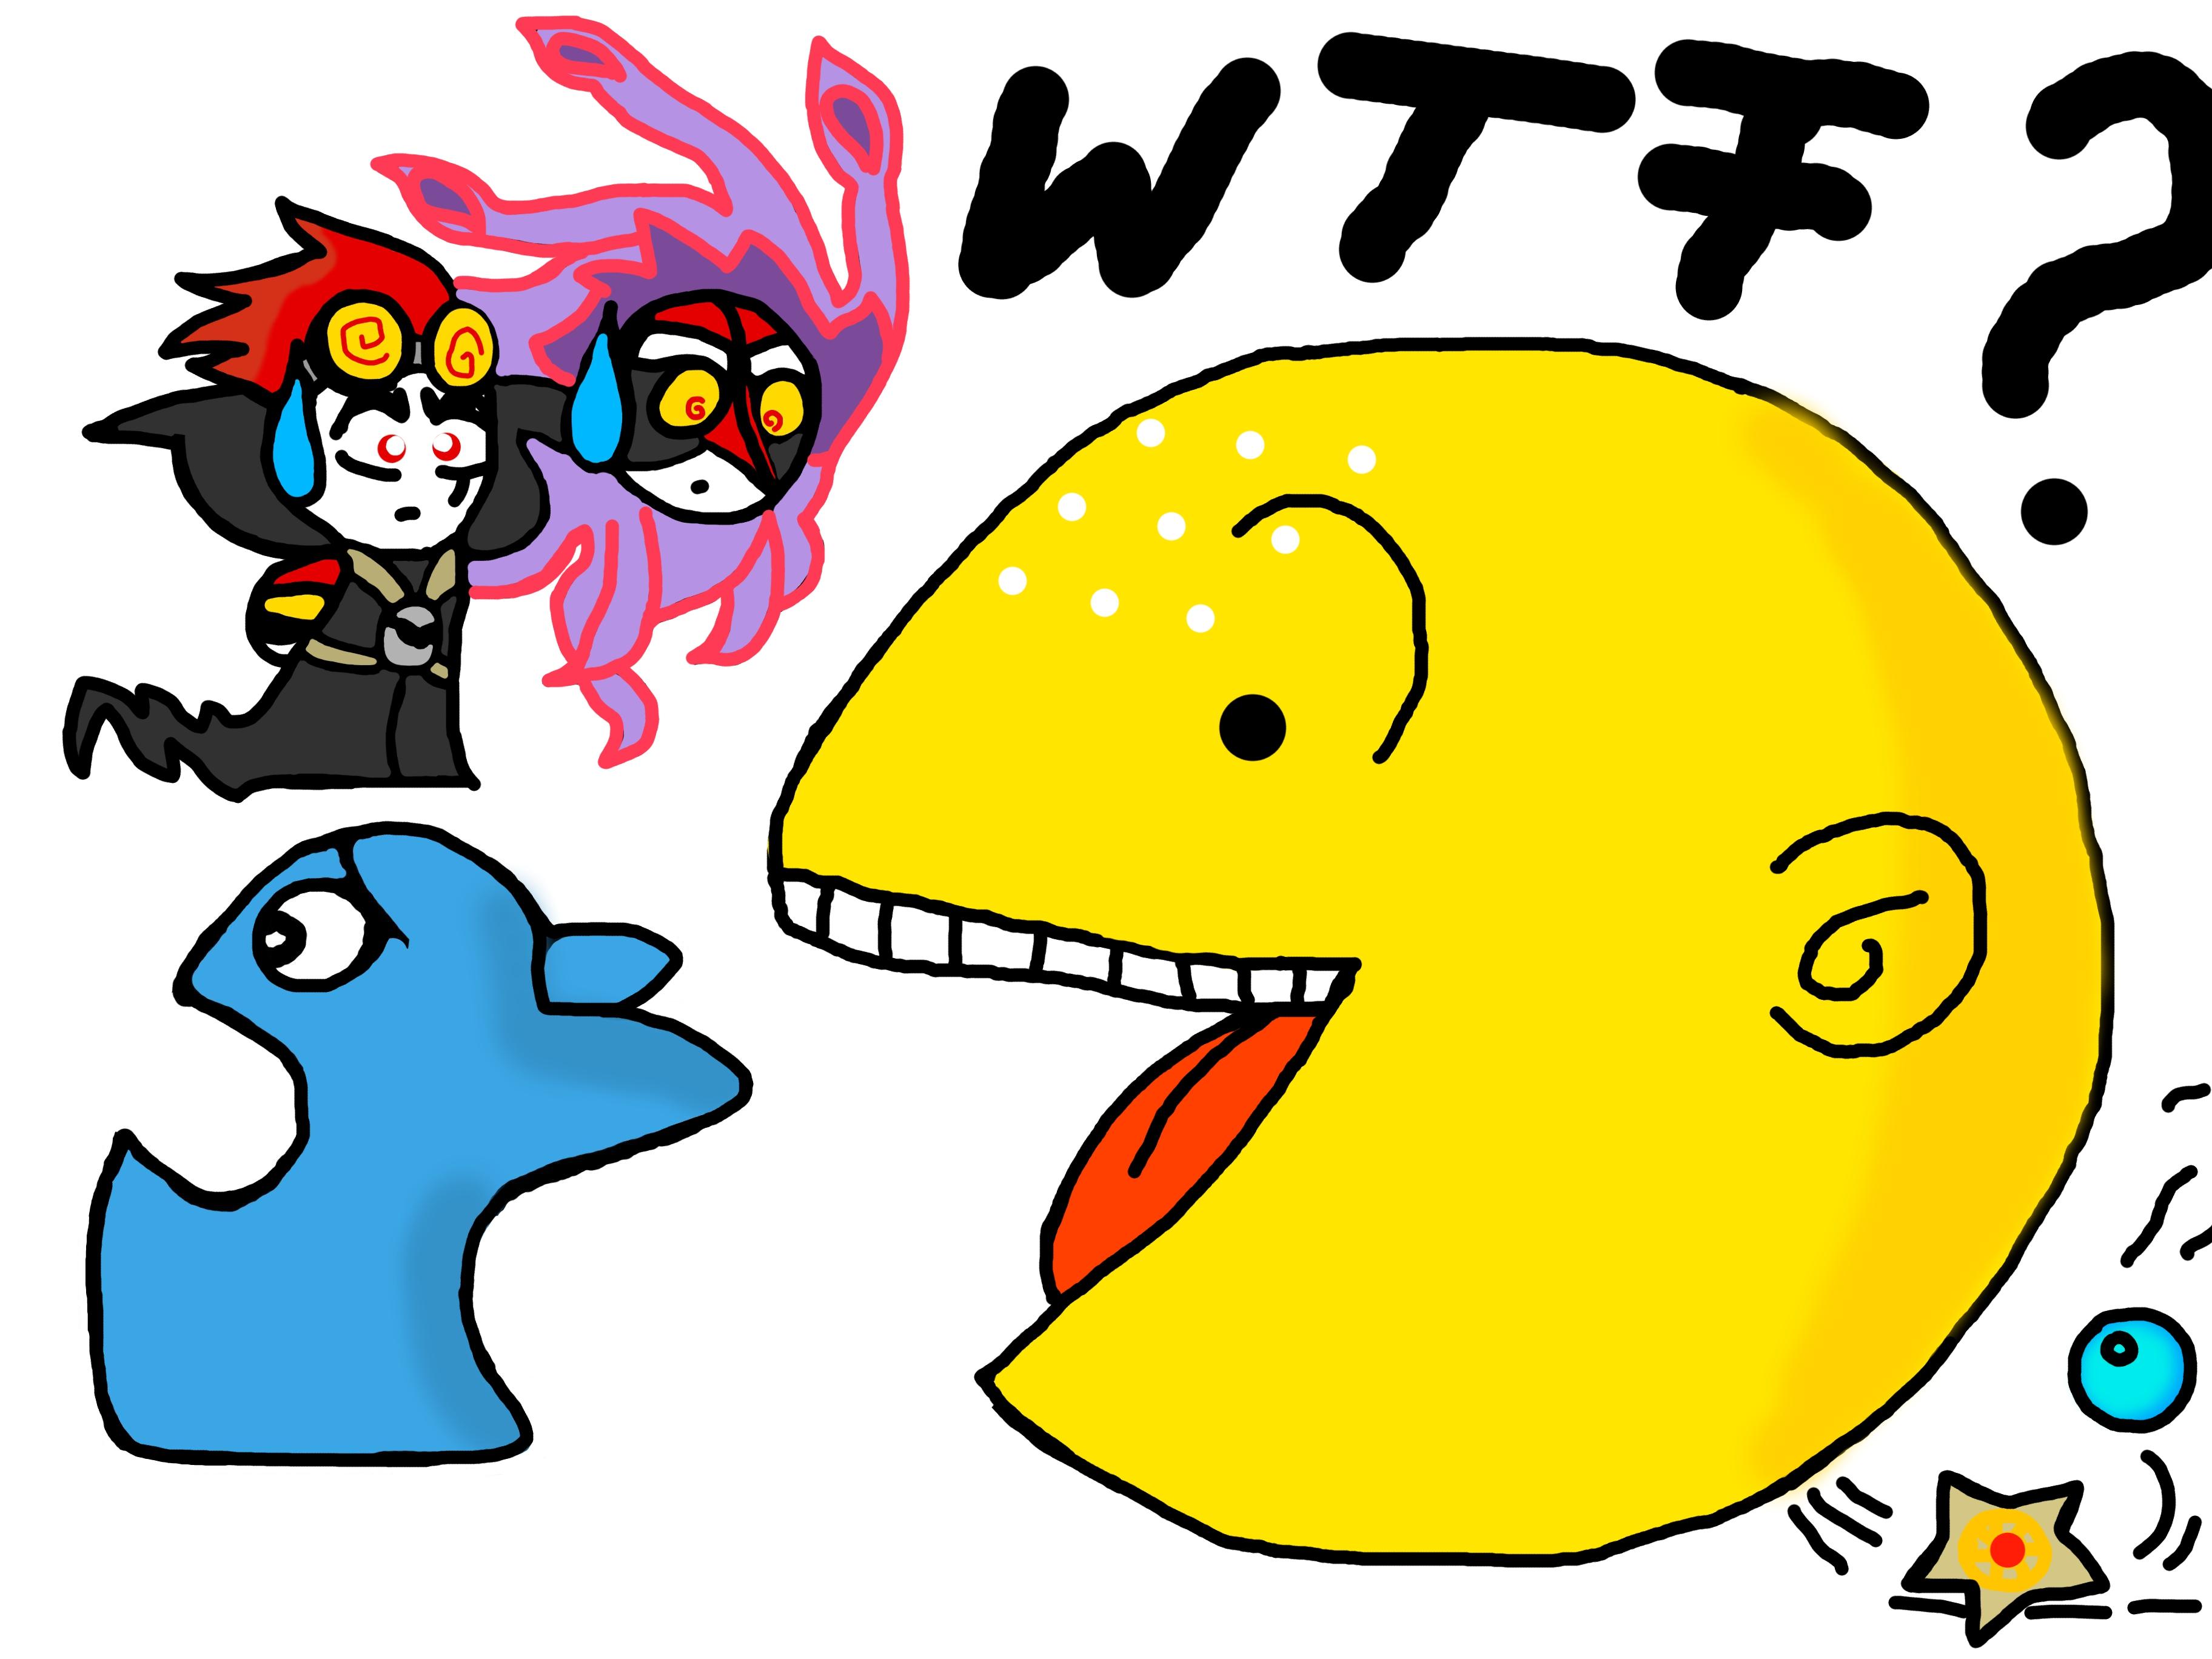 Xiaolin Showdown Pacman By FUNFUNFUNPRODUCTION On DeviantArt